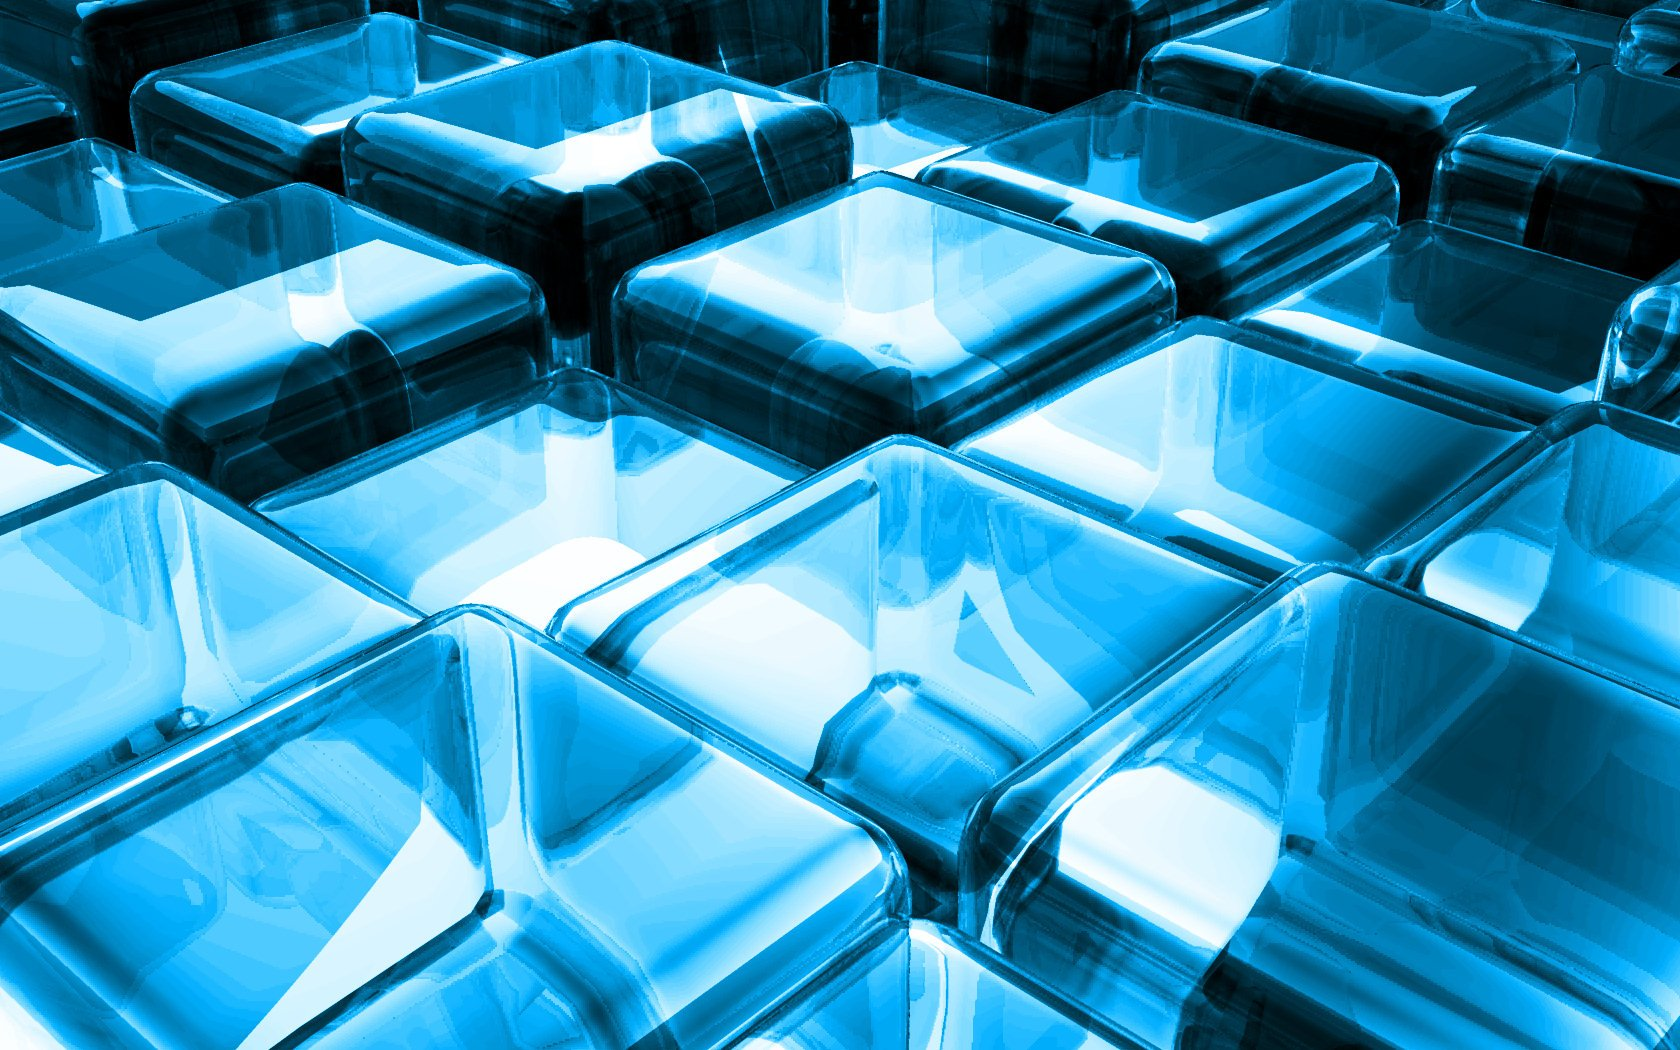 CGI - Cube  Abstract Digital Art CGI 3D Wallpaper